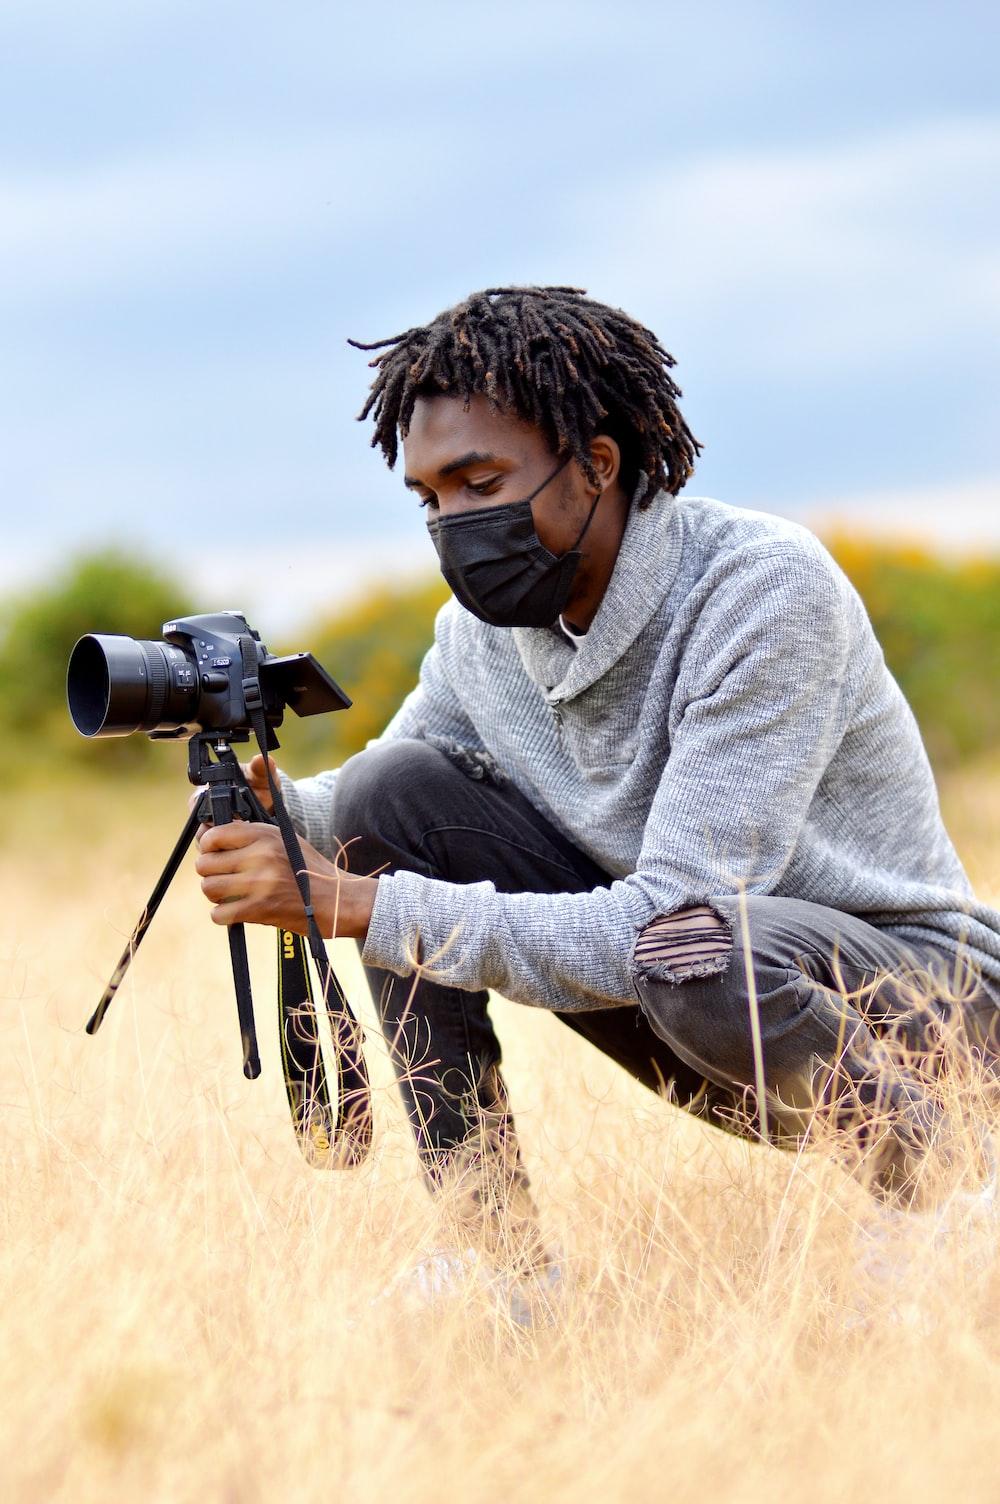 man in gray sweater using black dslr camera